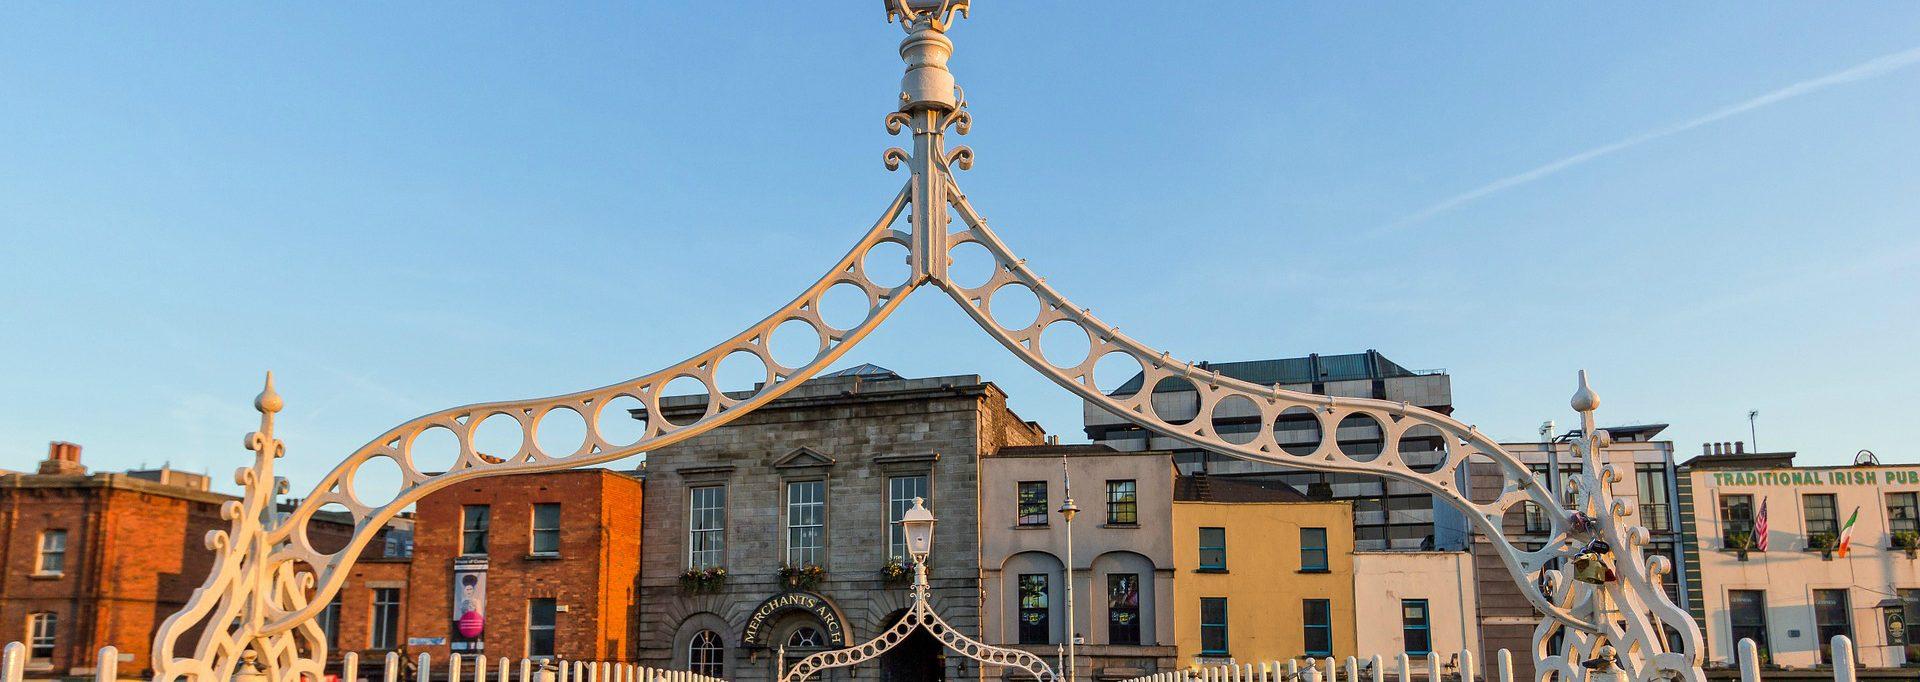 Free Things To Do In Dublin Ha'Penny Bridge